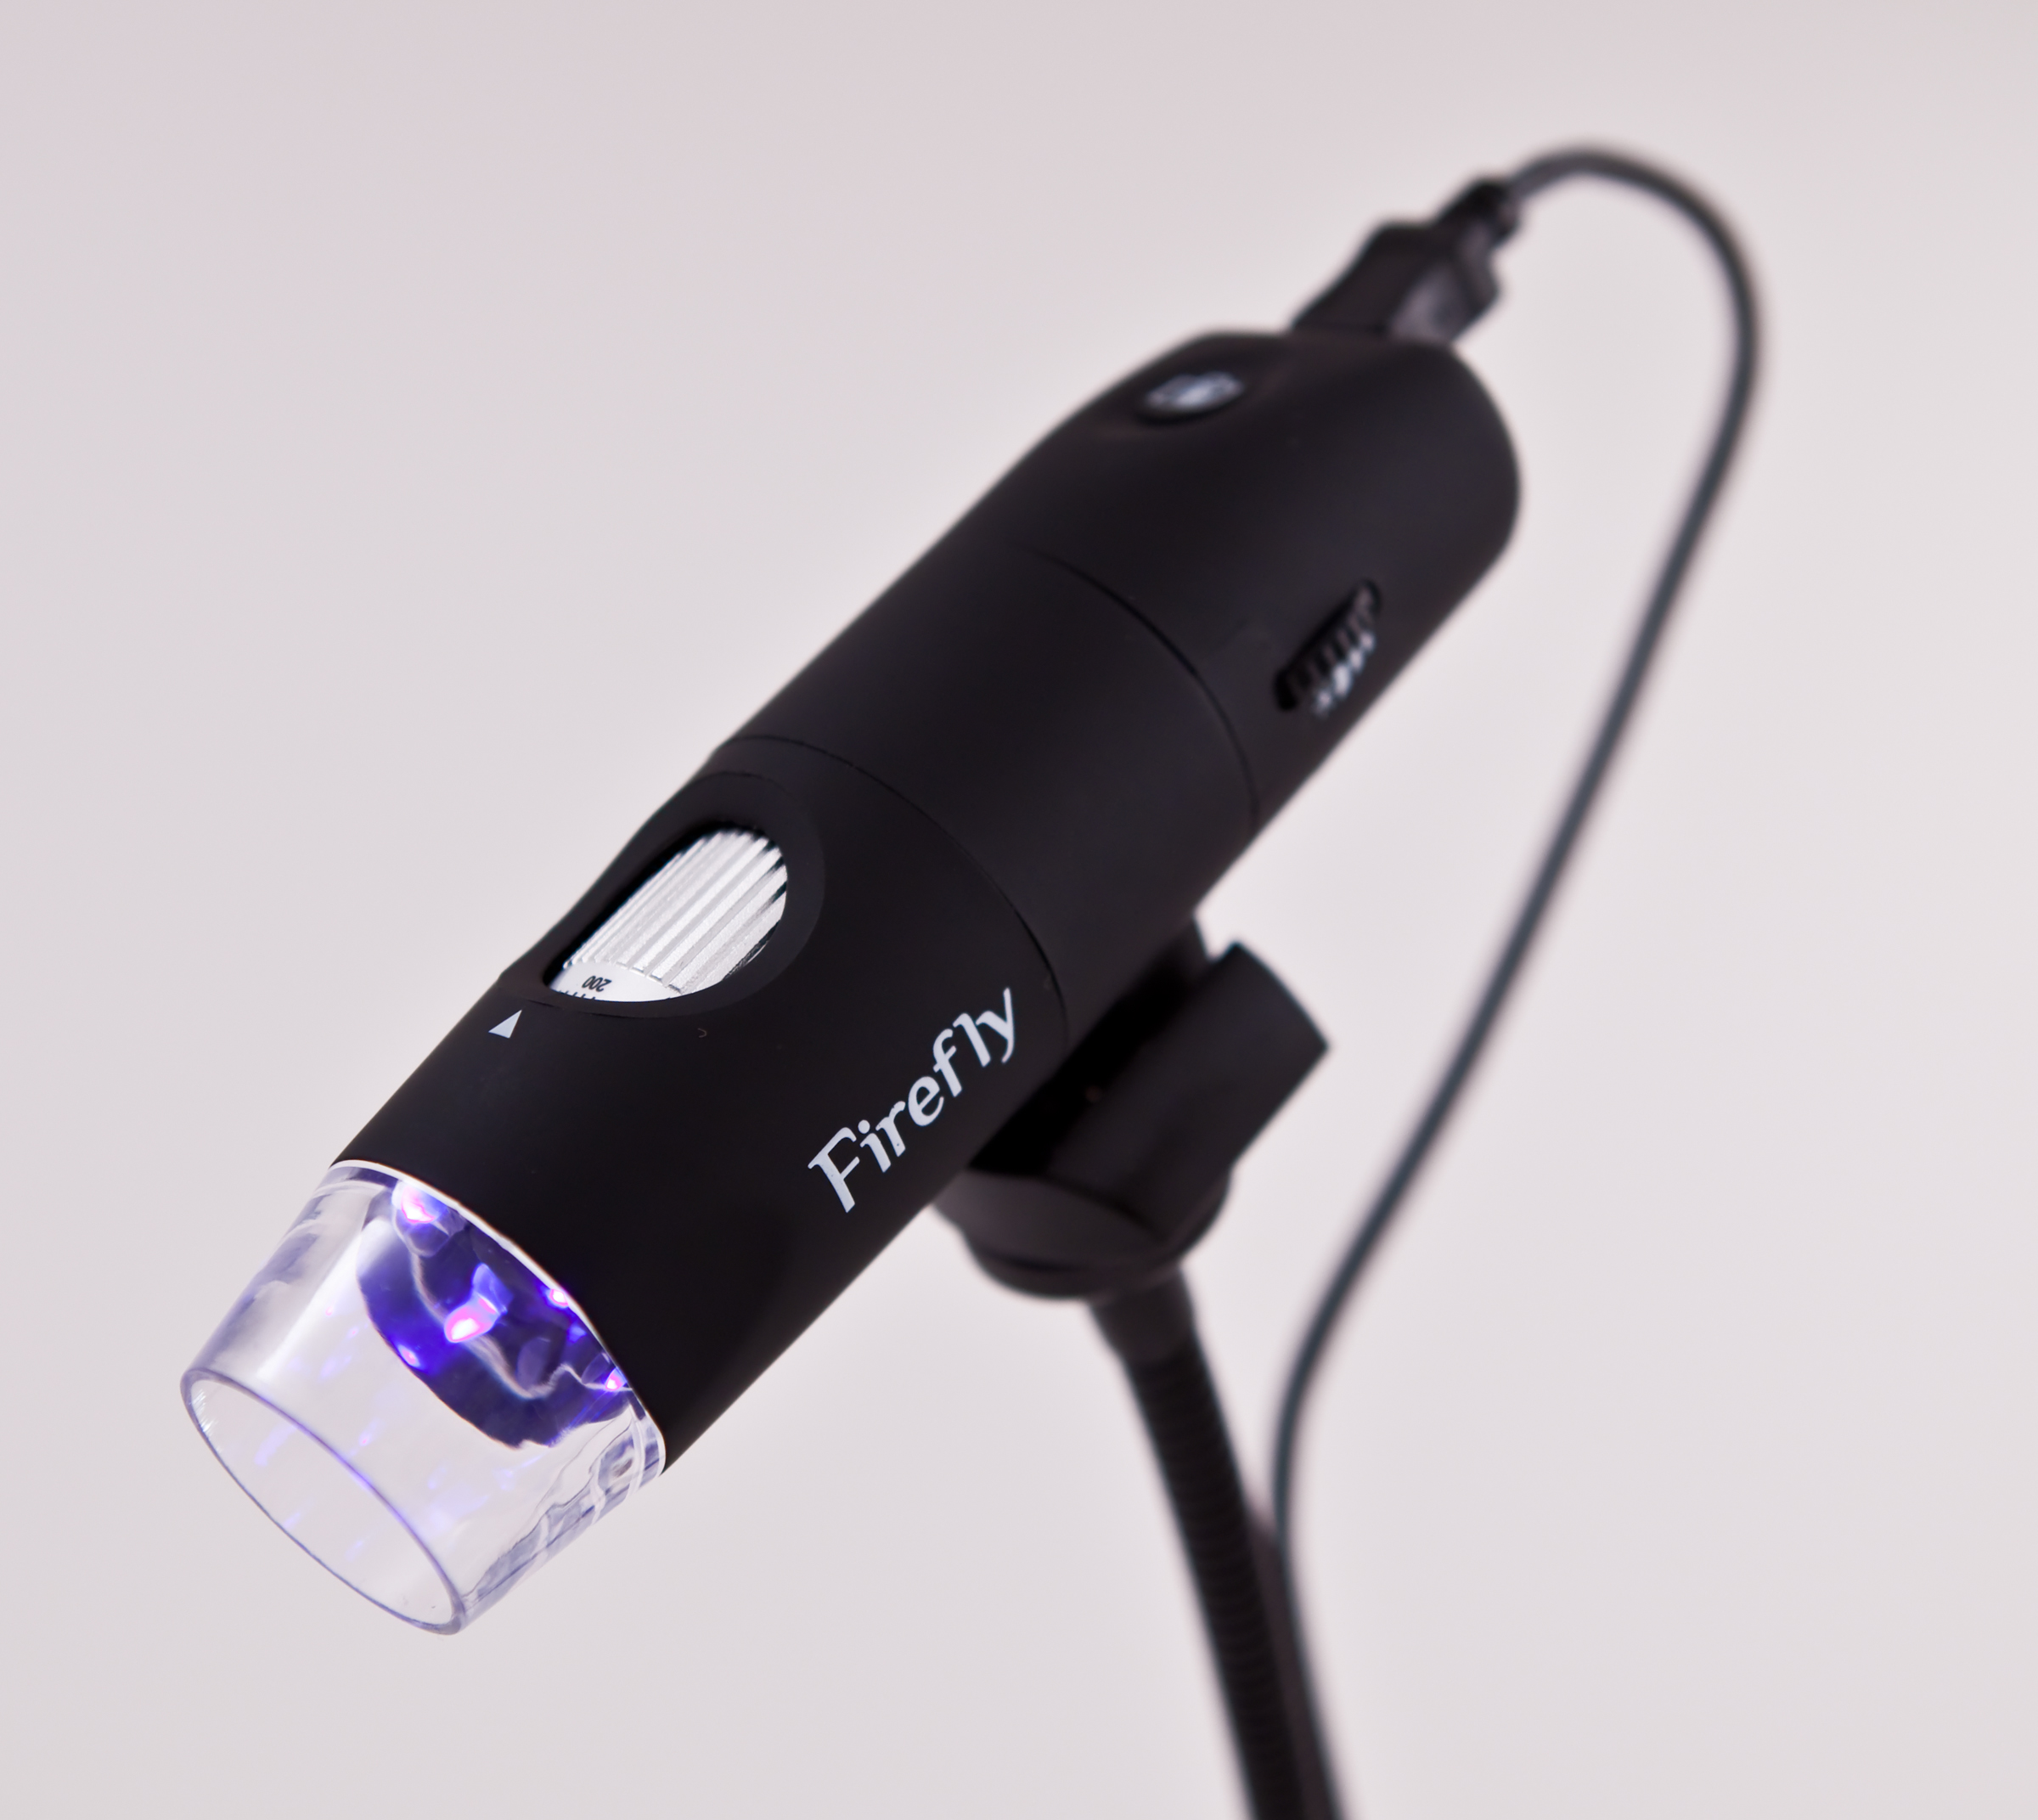 Caméra Microscope numérique USB UV 2 mégapixels Firefly GT700